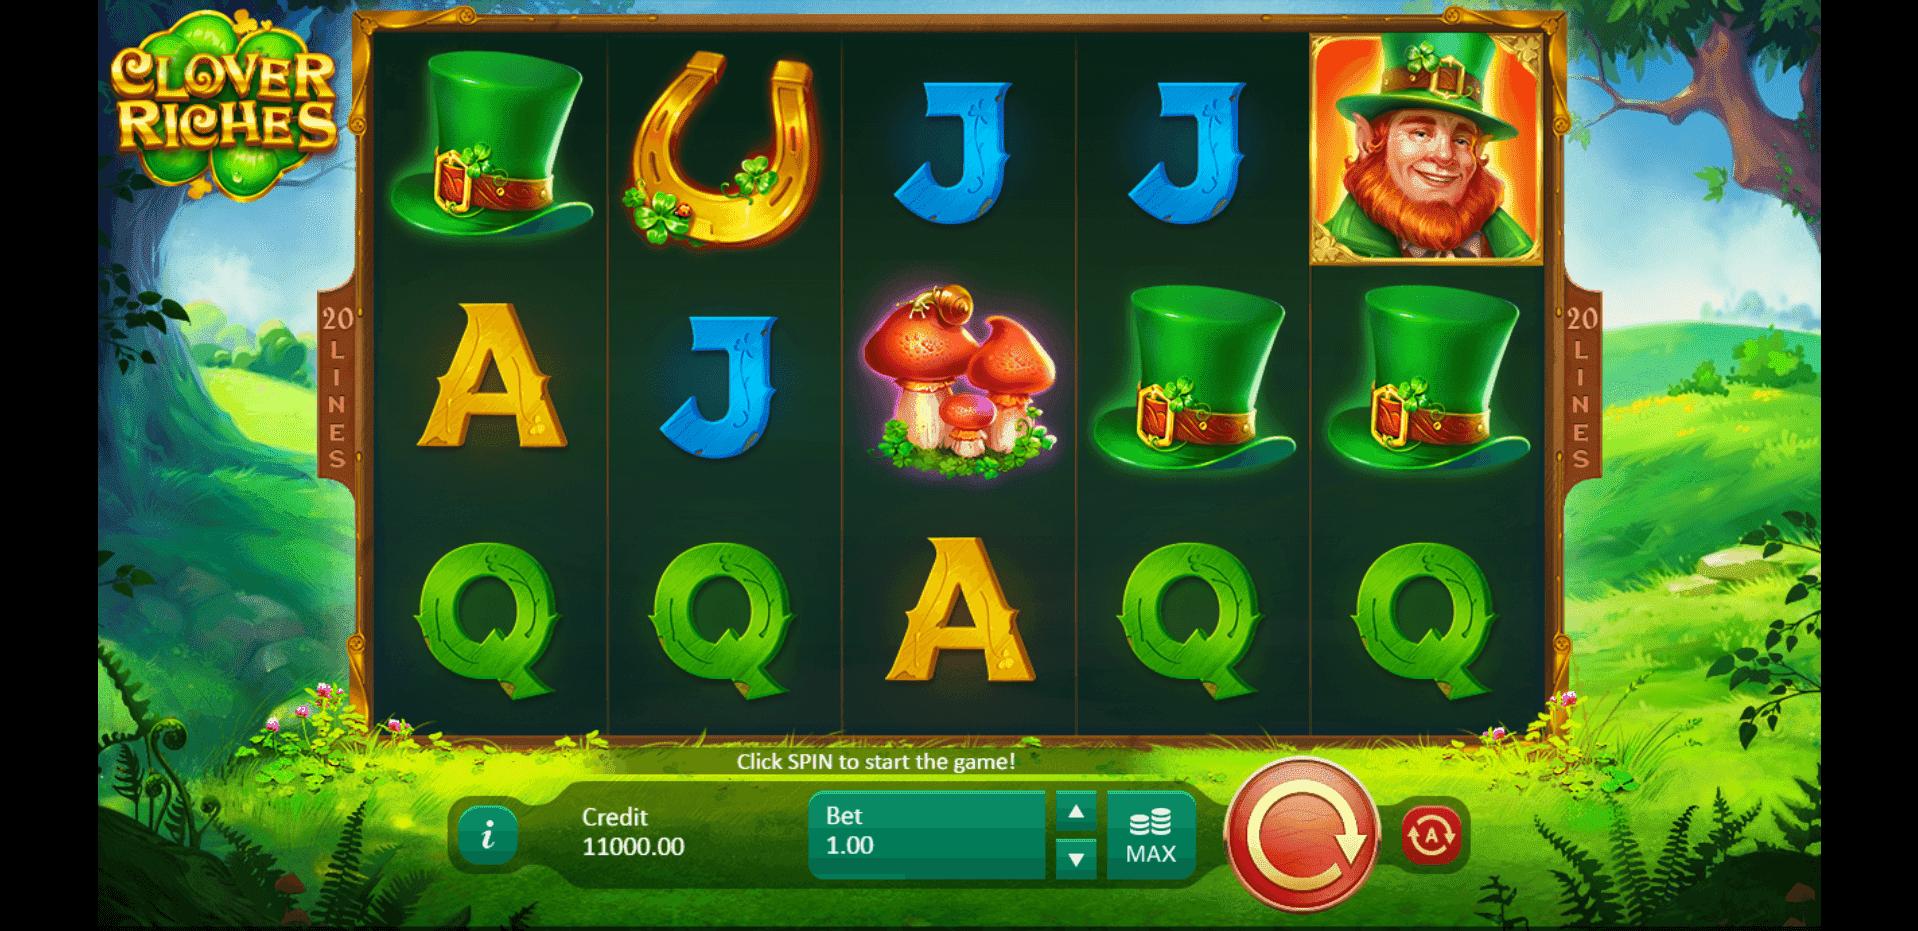 Clover Riches slot machine screenshot